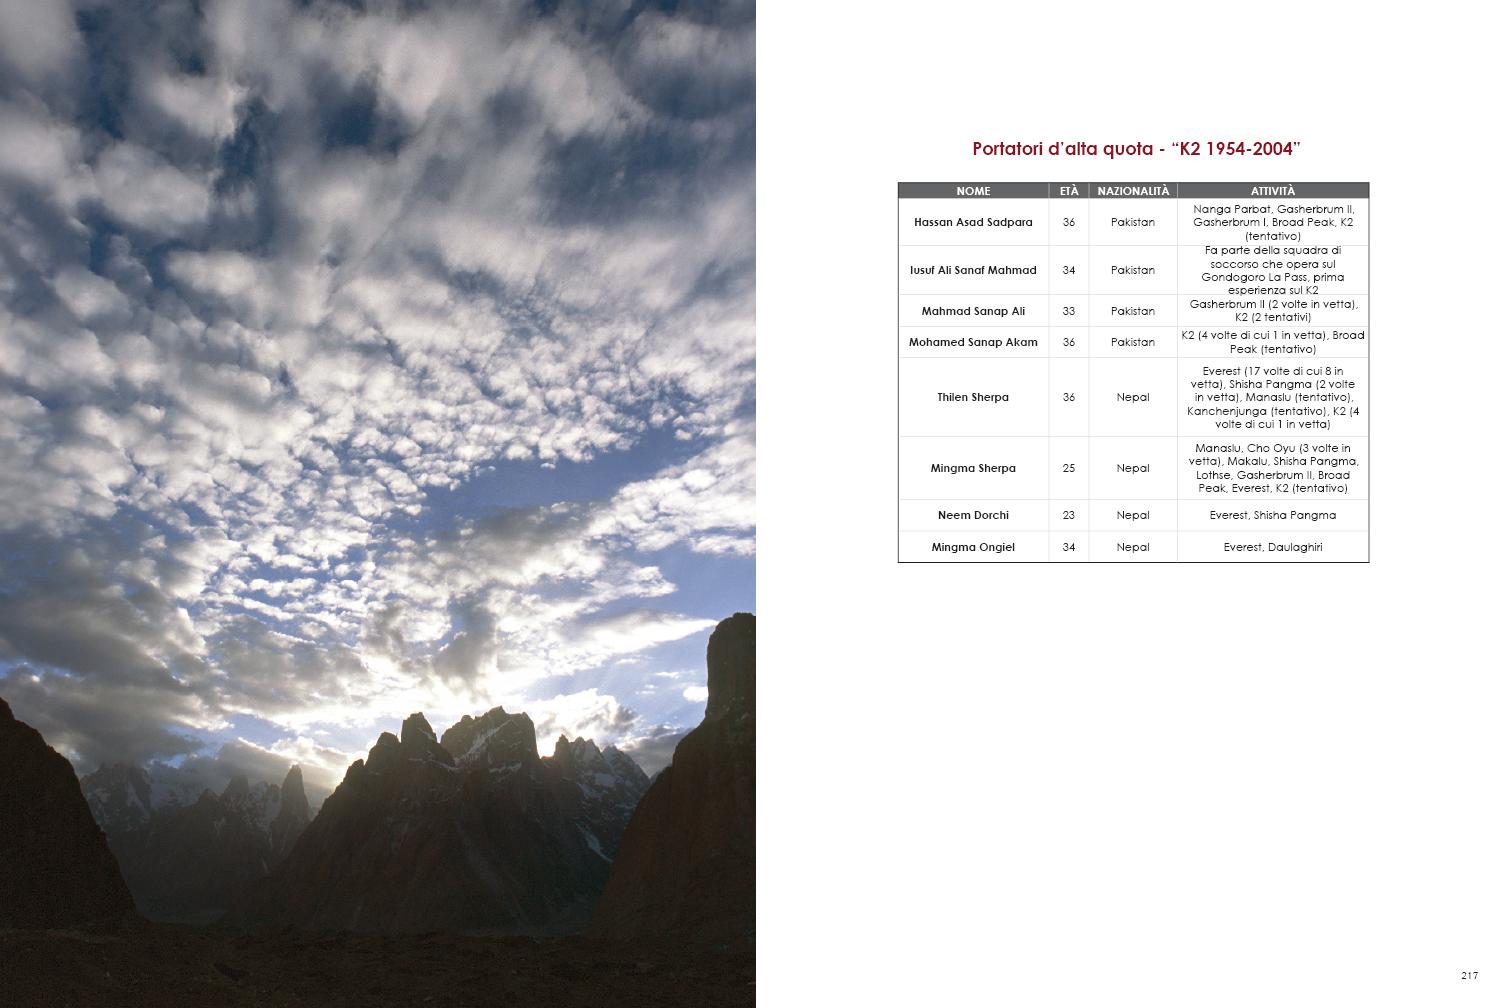 K2 EXPEDITION 1954-2004 Giuseppe Ghedina Fotografo - 110.jpg